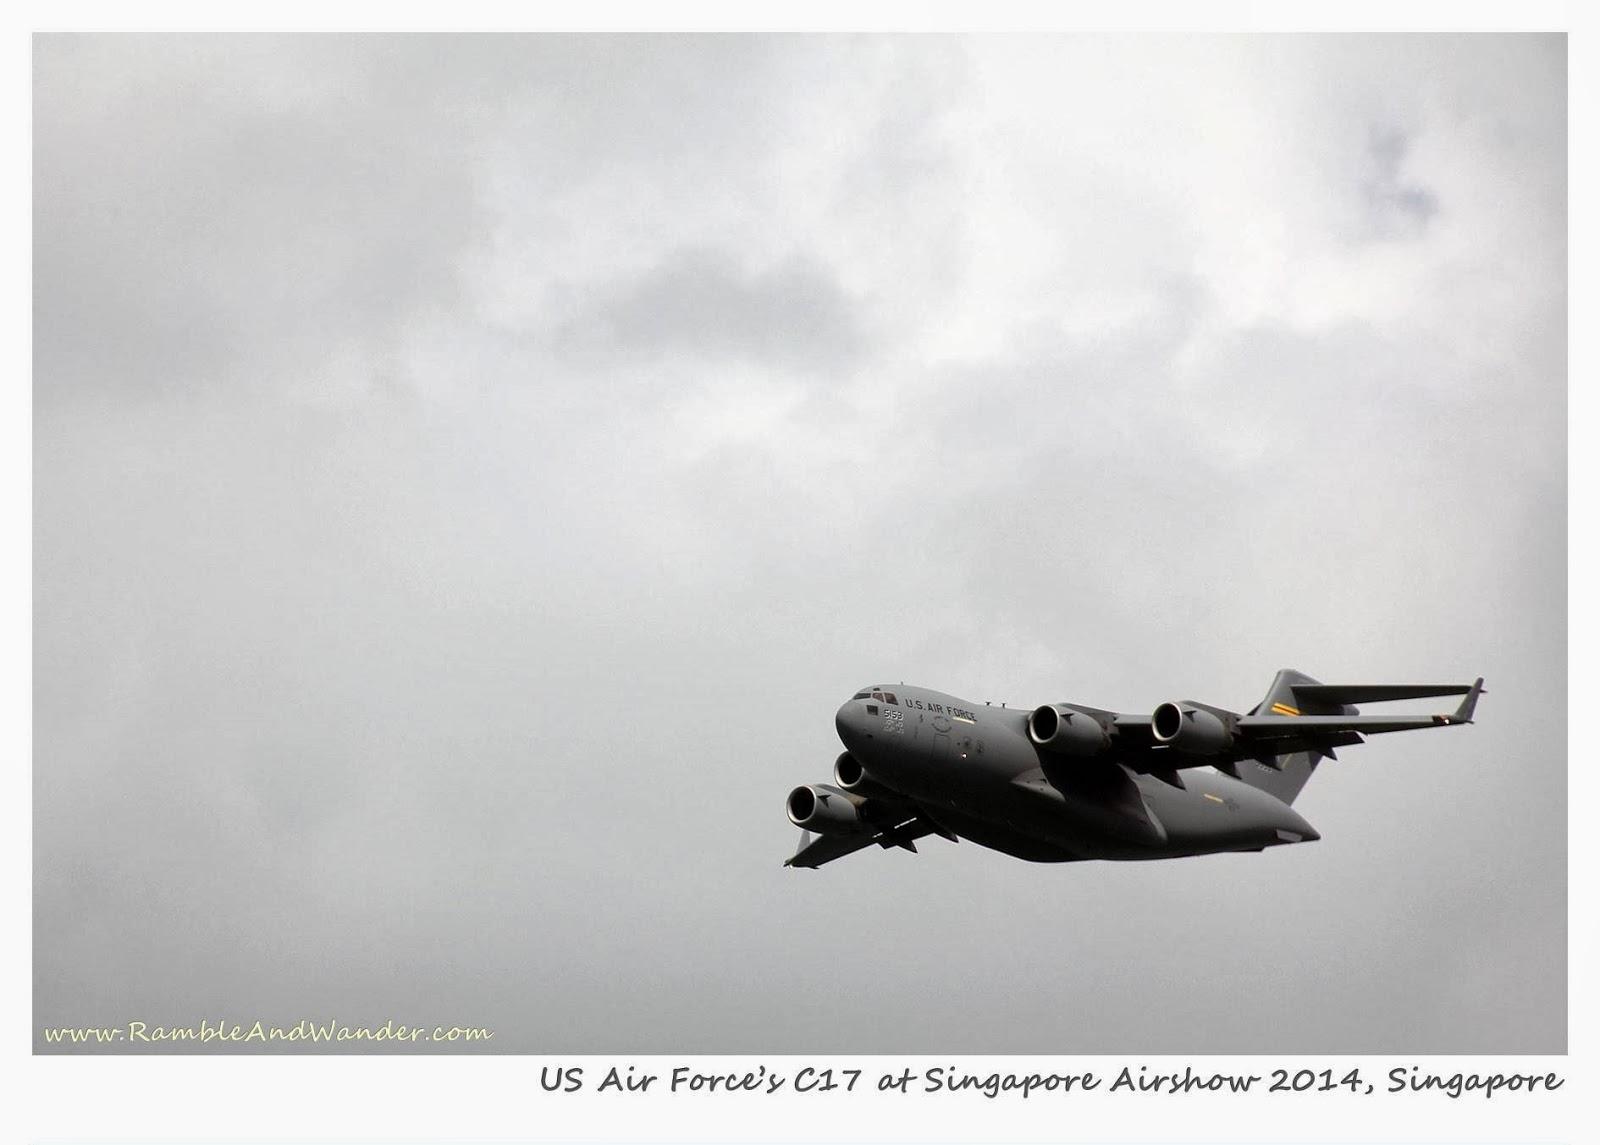 Singapore Airshow | www.rambleandwander.com